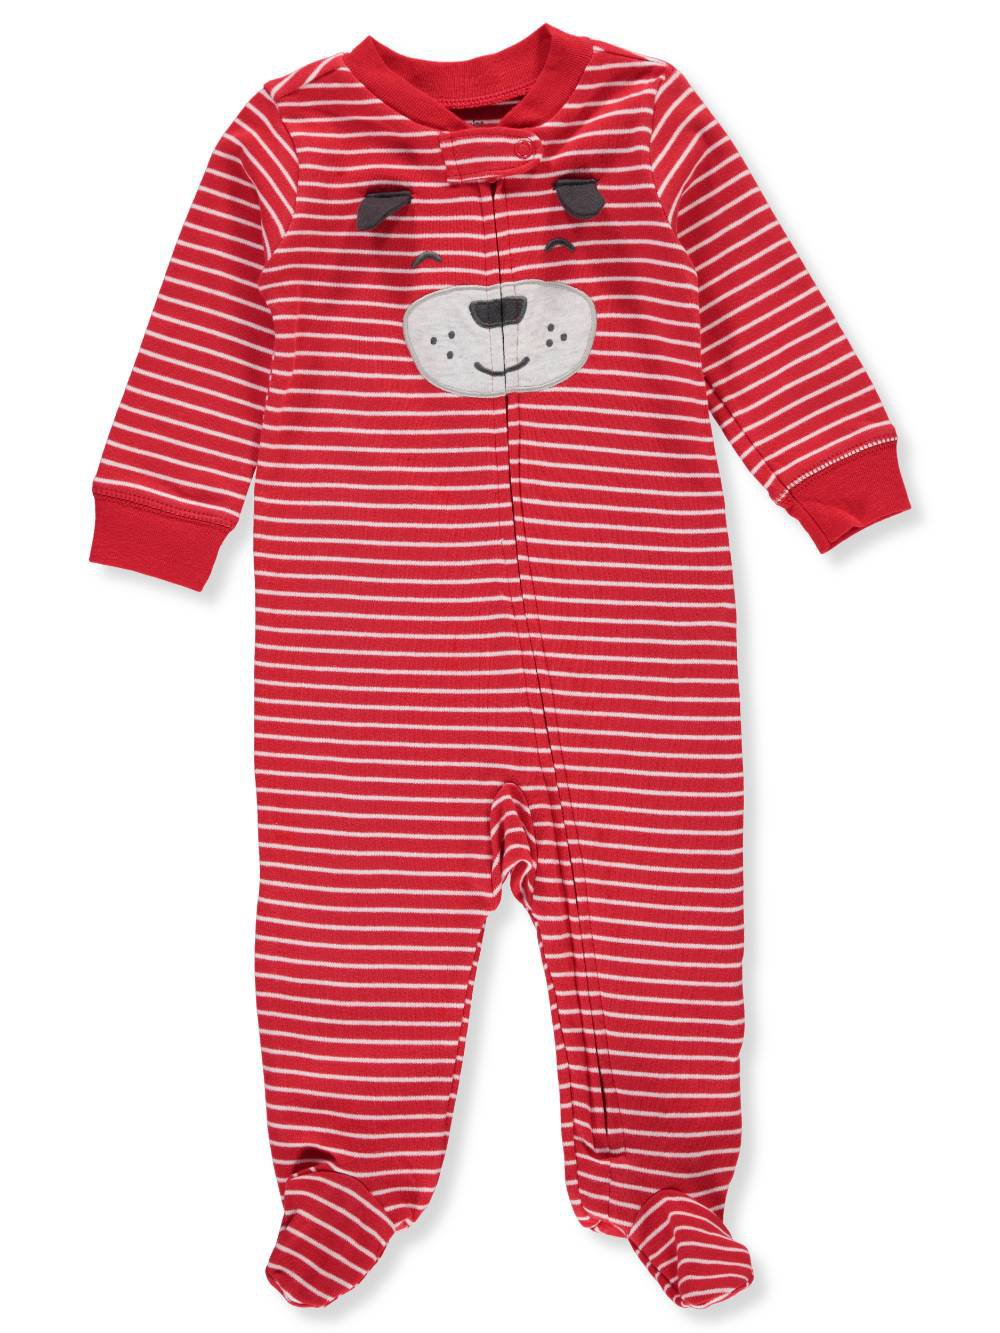 Carter's Baby Boys' Cotton Zip-up Sleep N Play